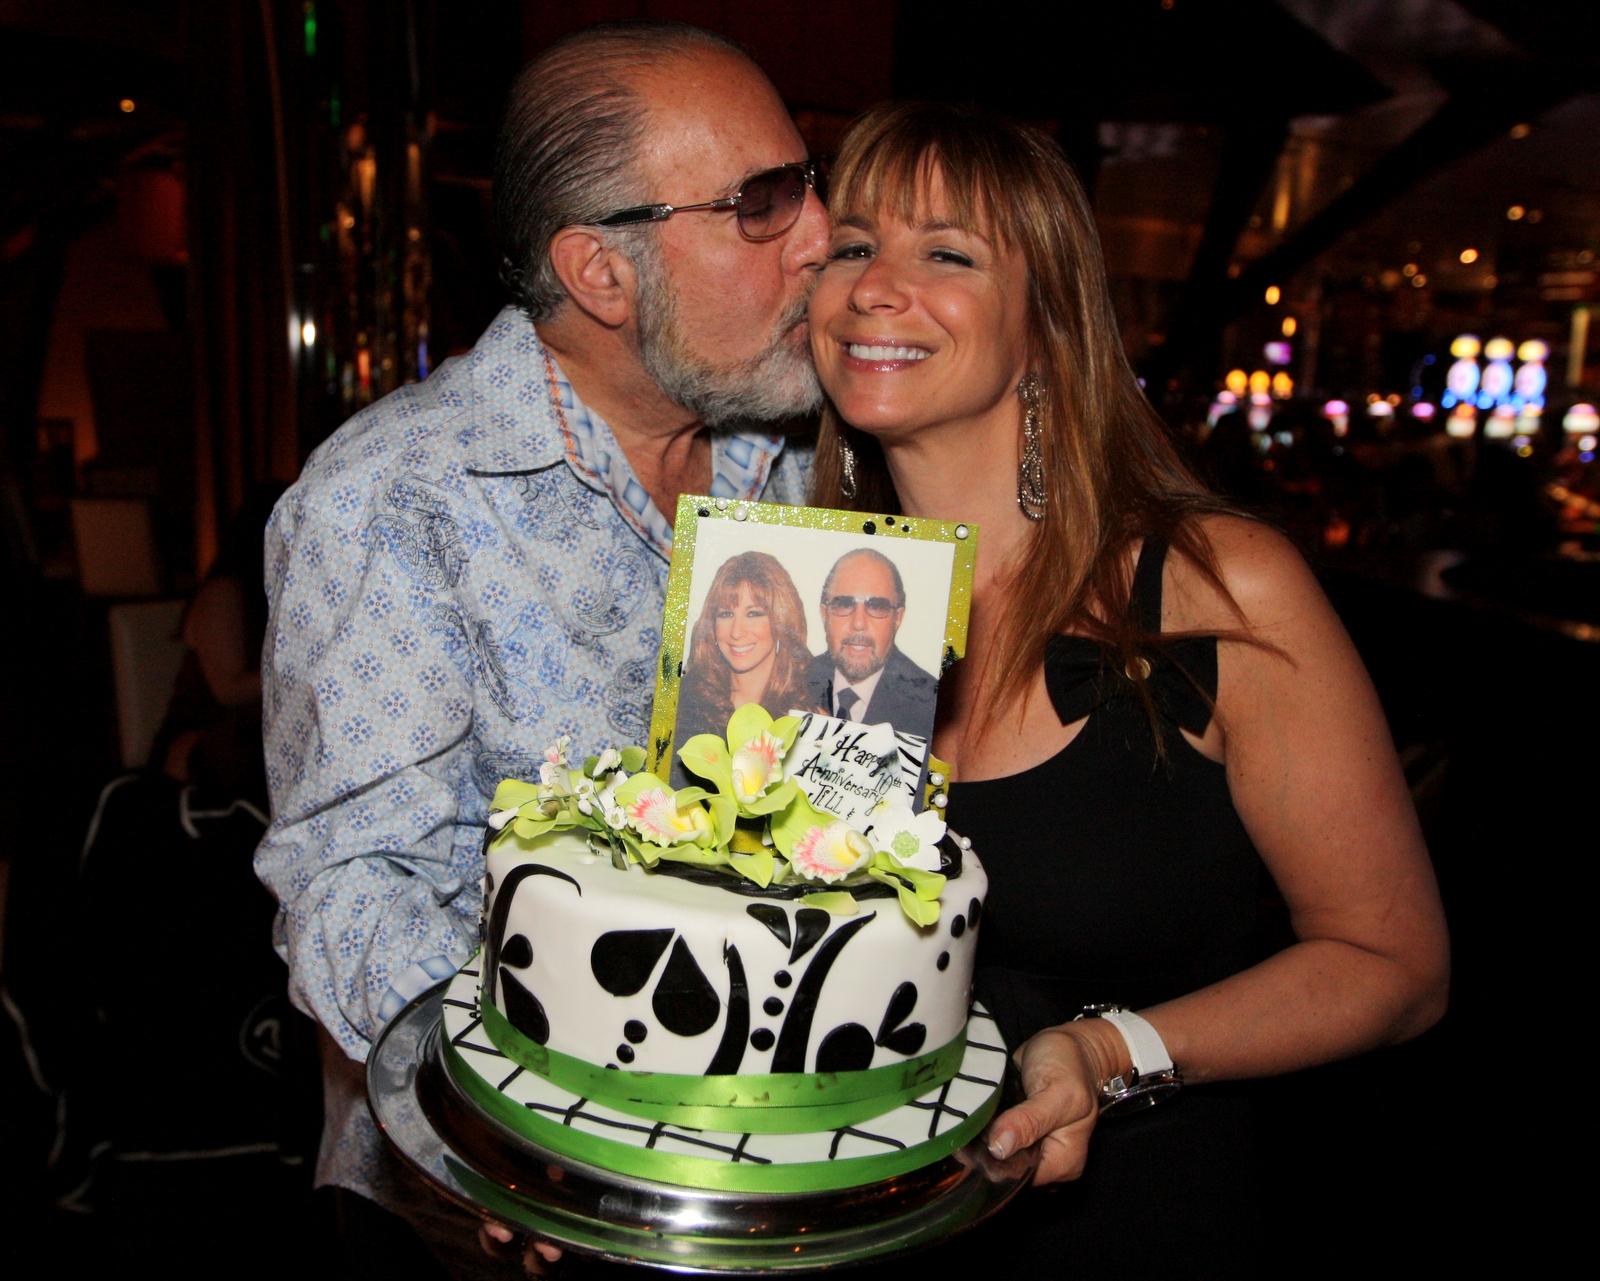 Jill Zarin reveals her husband's cancer has returned